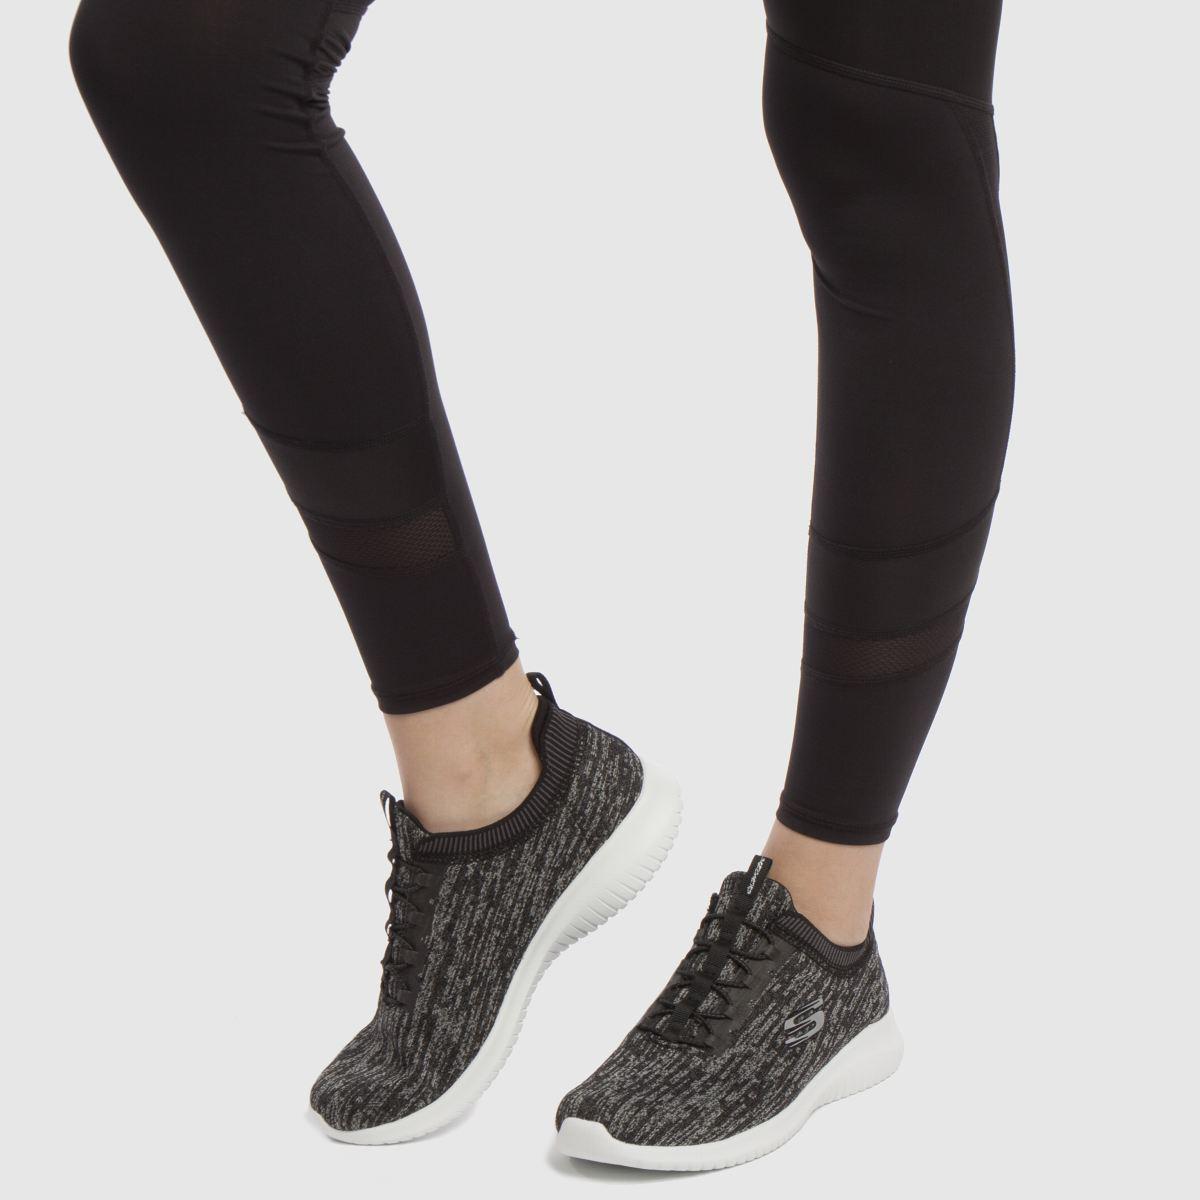 Damen Schwarz-grau skechers Ultra Flex Bright Sneaker | schuh Gute Qualität beliebte Schuhe